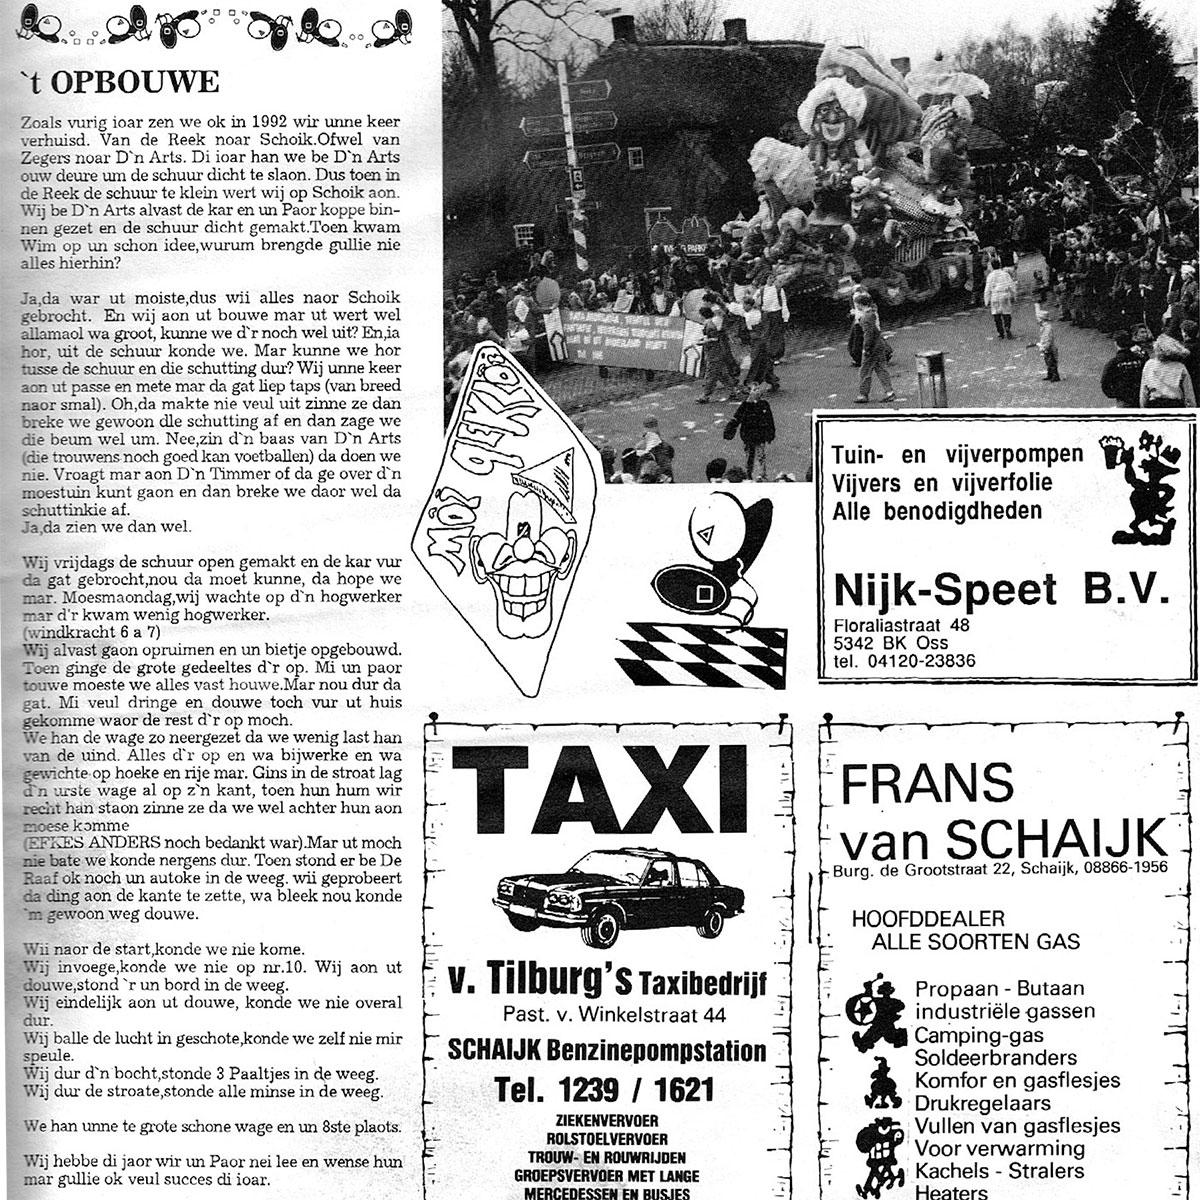 Stukje uit de carnavalskrant van Moi Gekloi - 1993